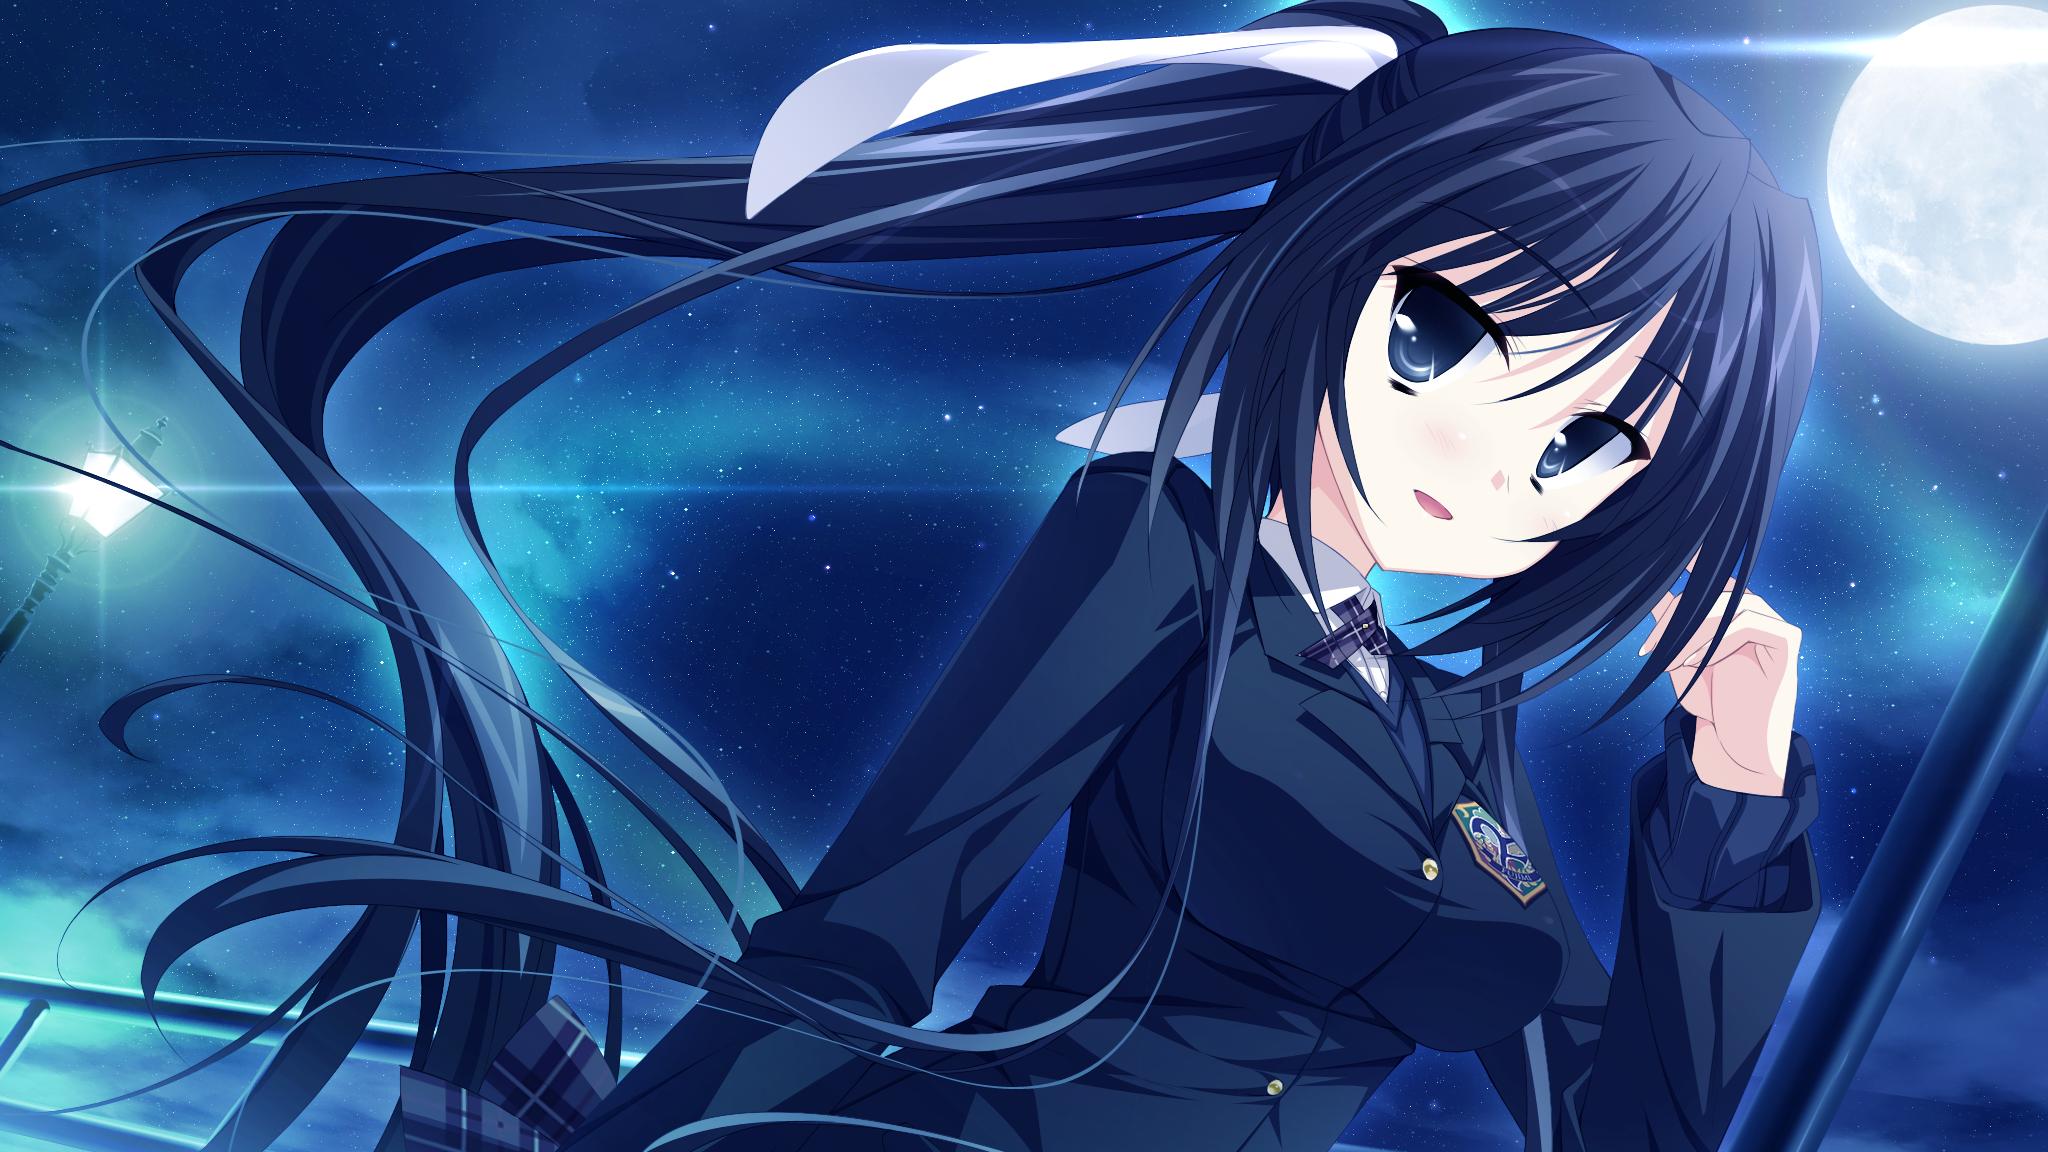 Download Anime Wallpaper 2048x1152 Wallpoper 362385 2048x1152